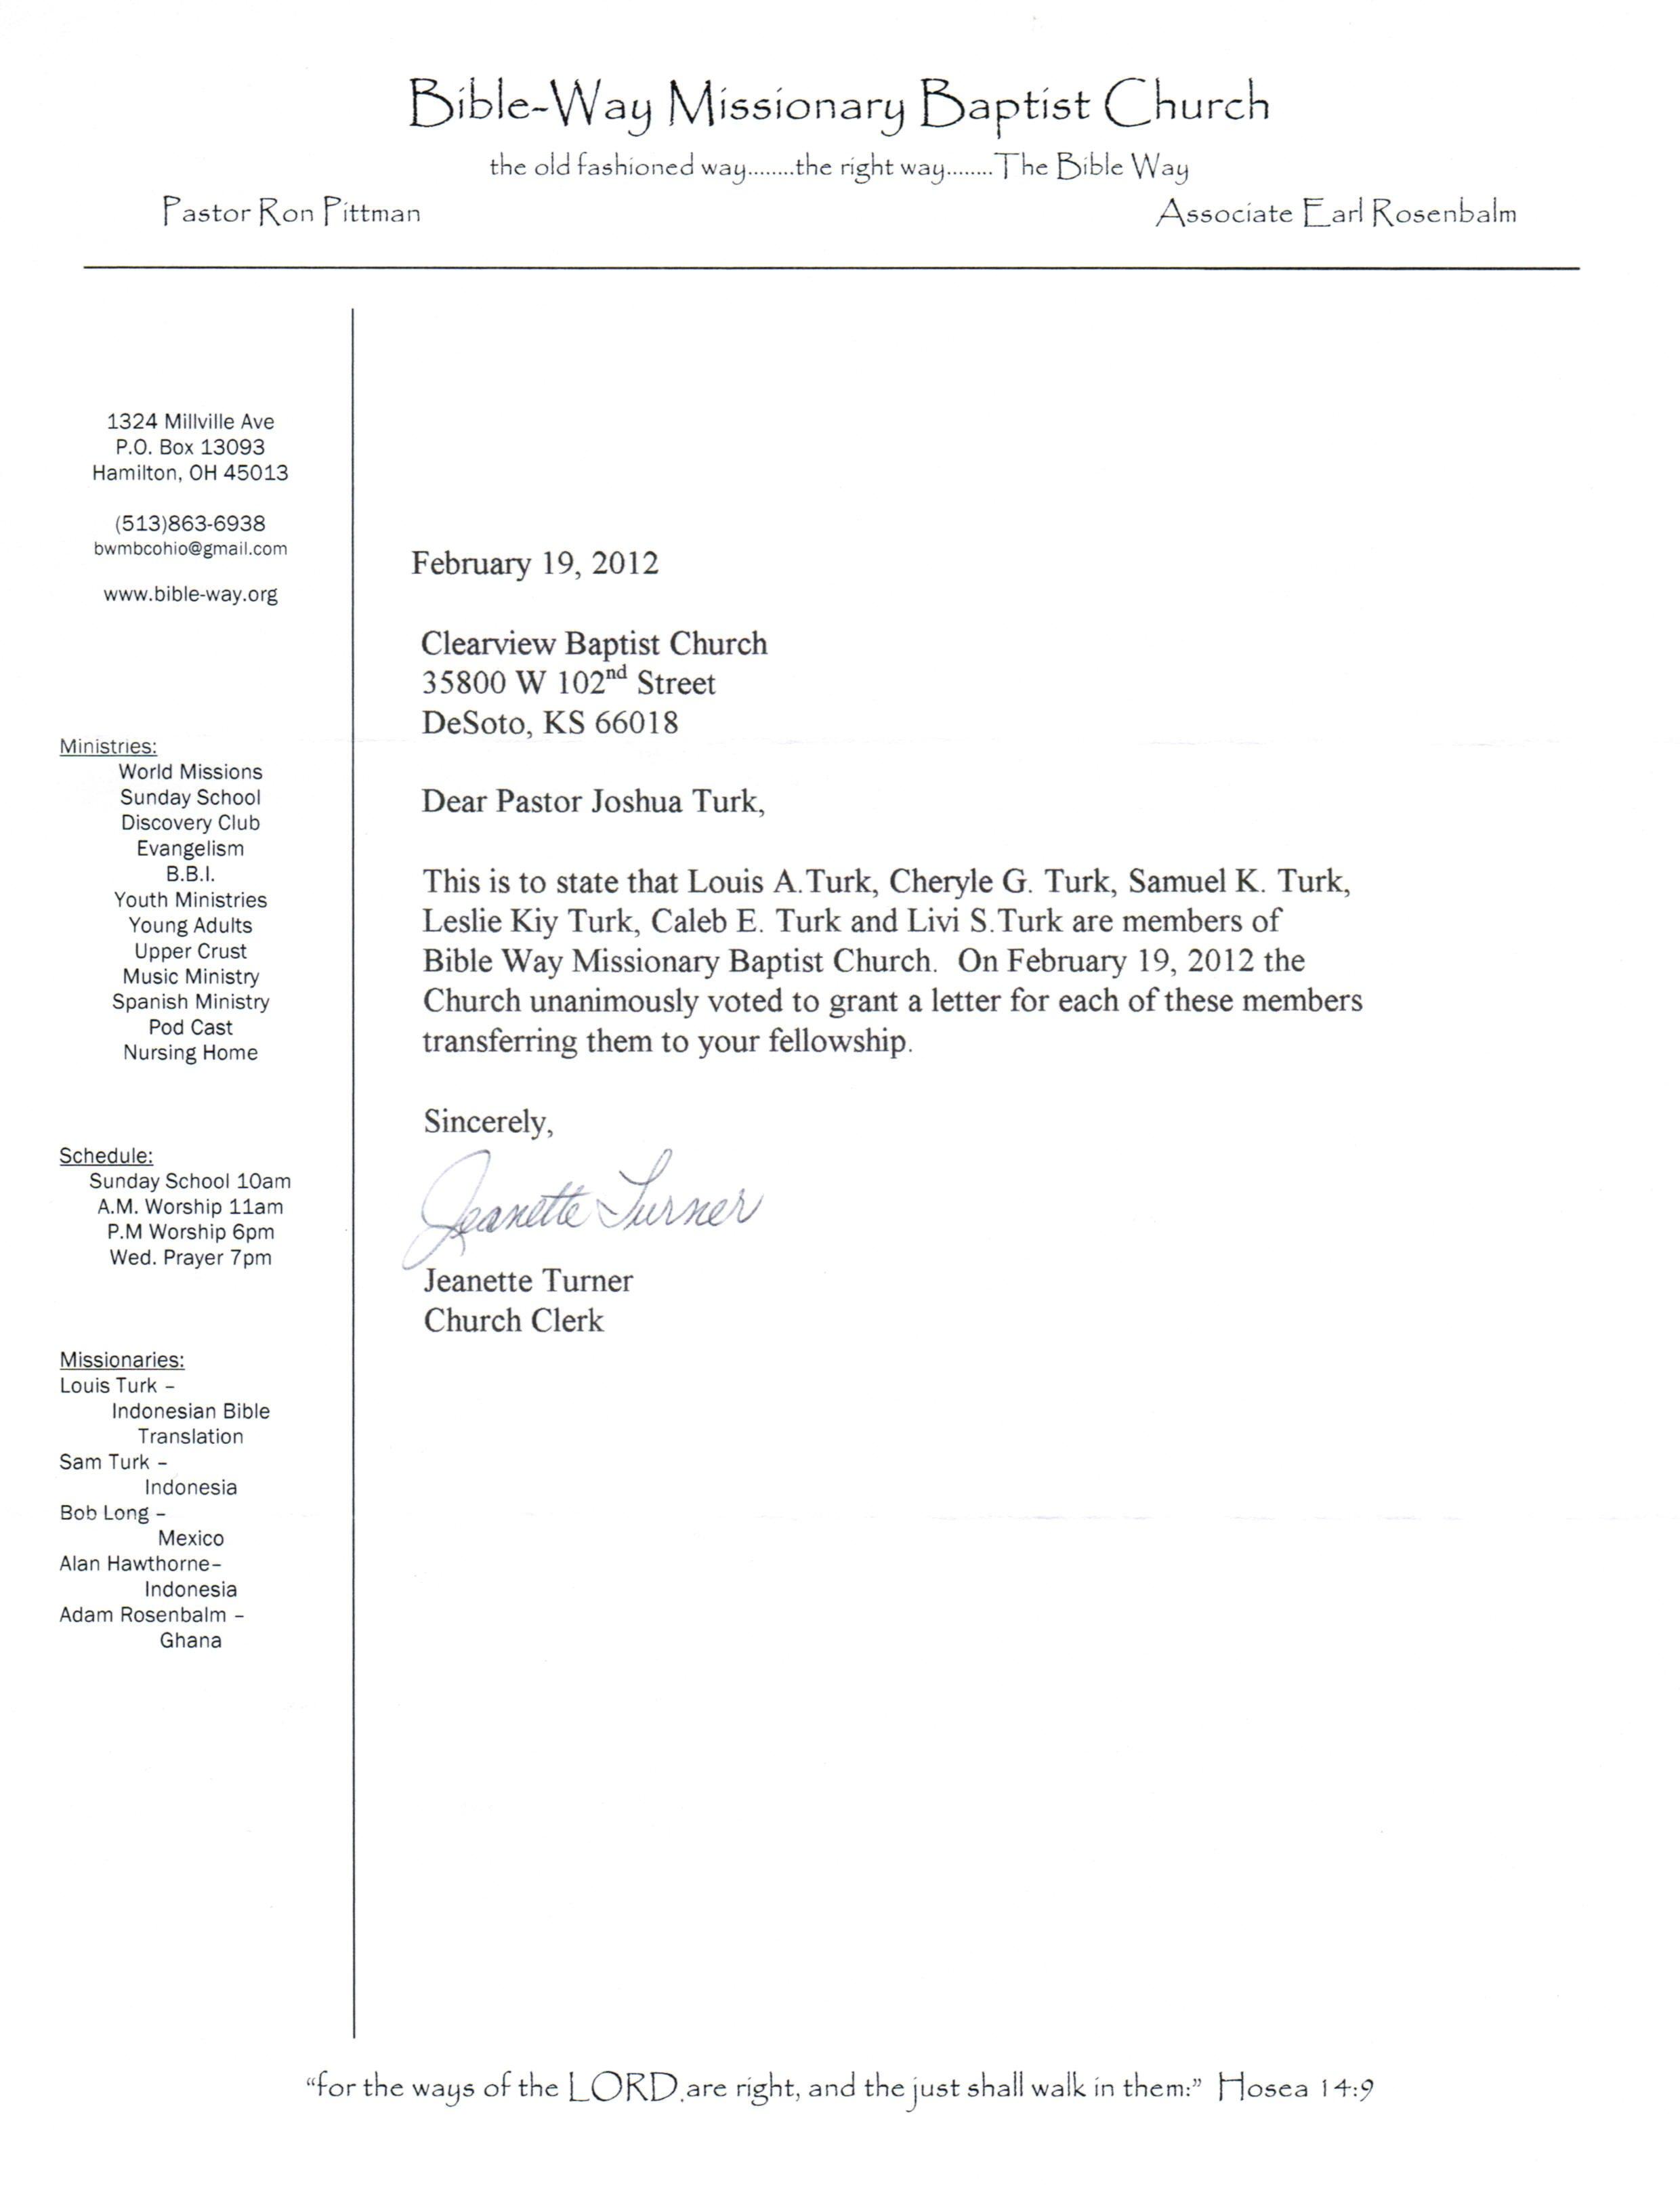 Church Membership Transfer Letter Sample Letter Moving Church Membership